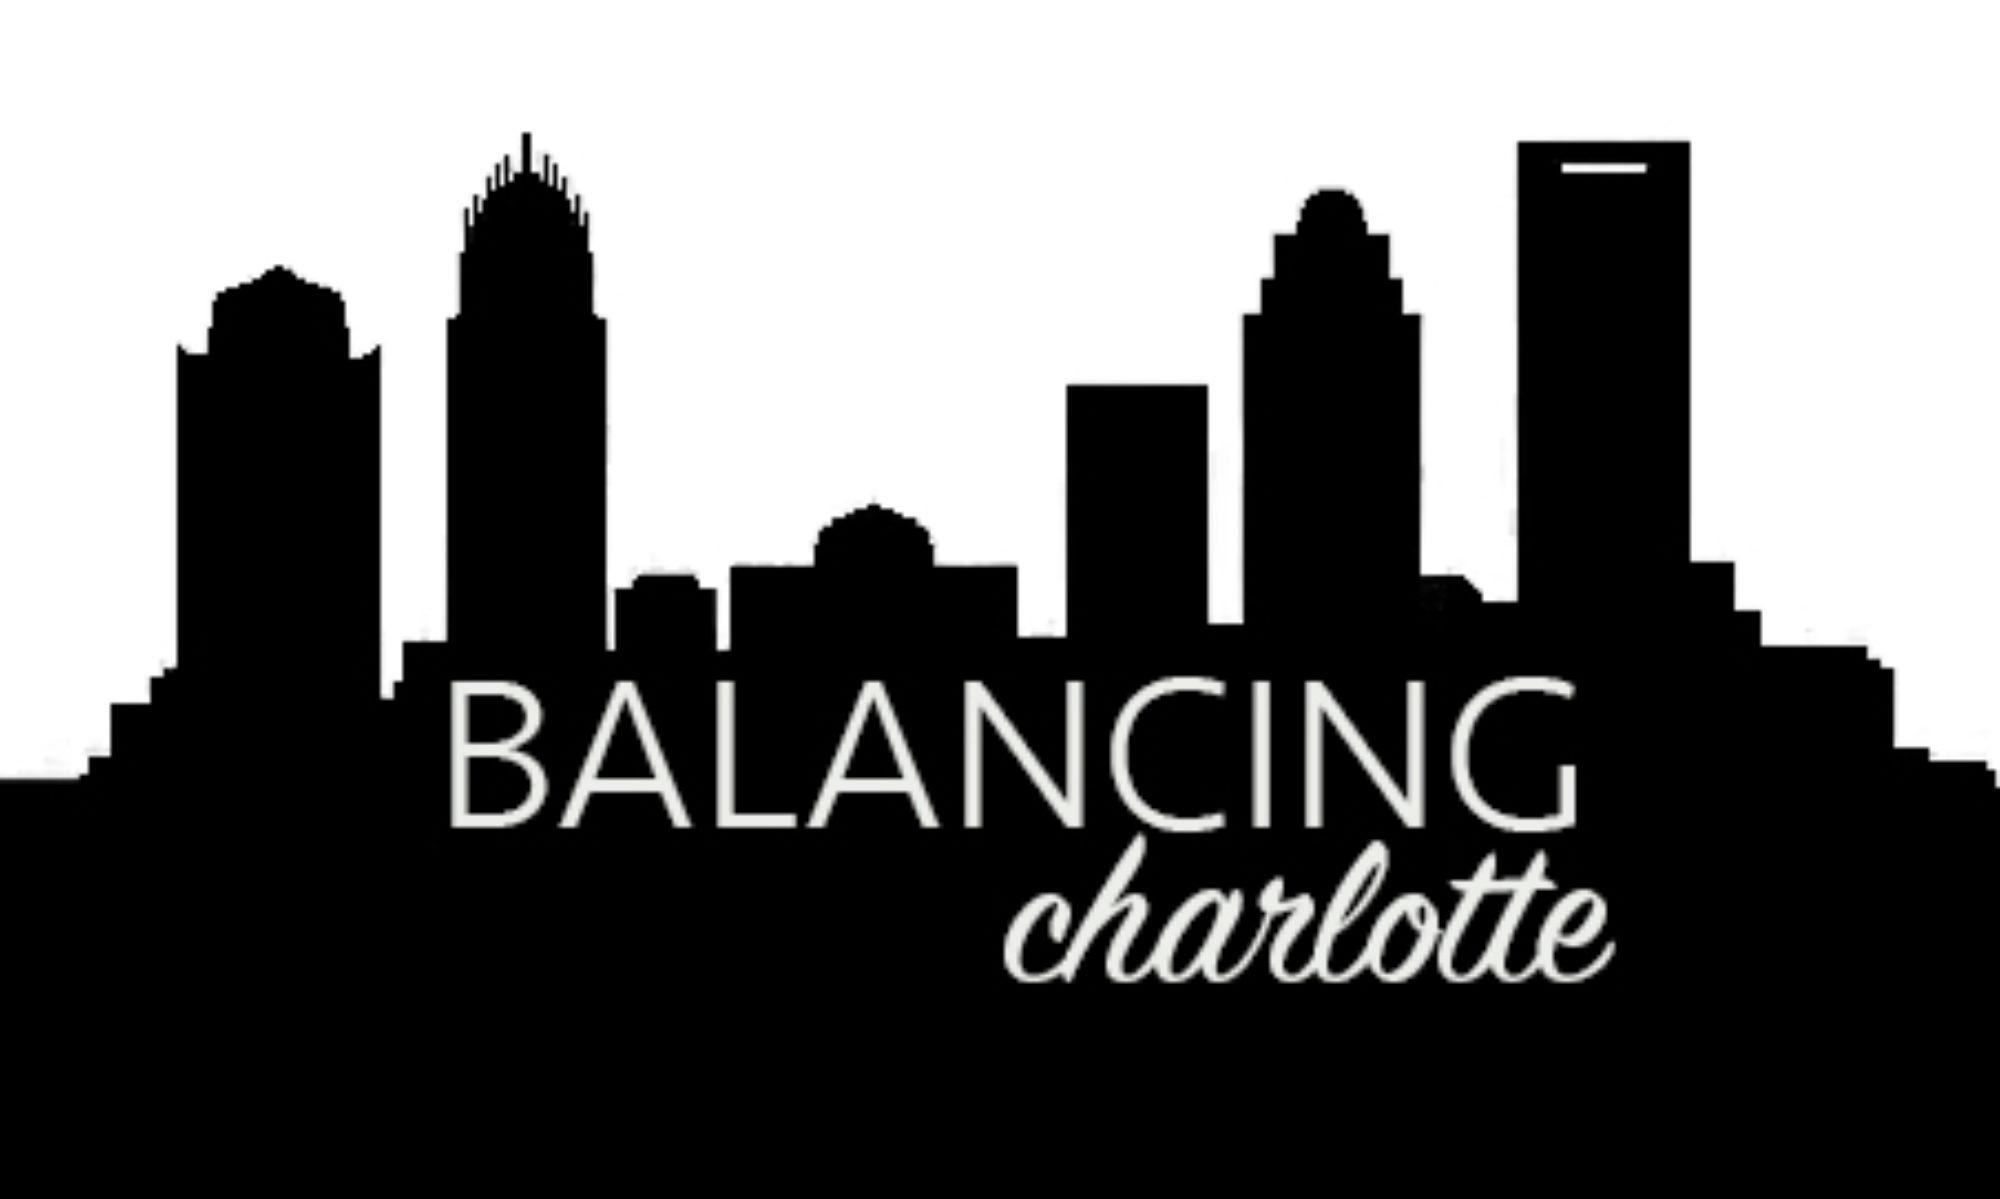 Balancing Charlotte